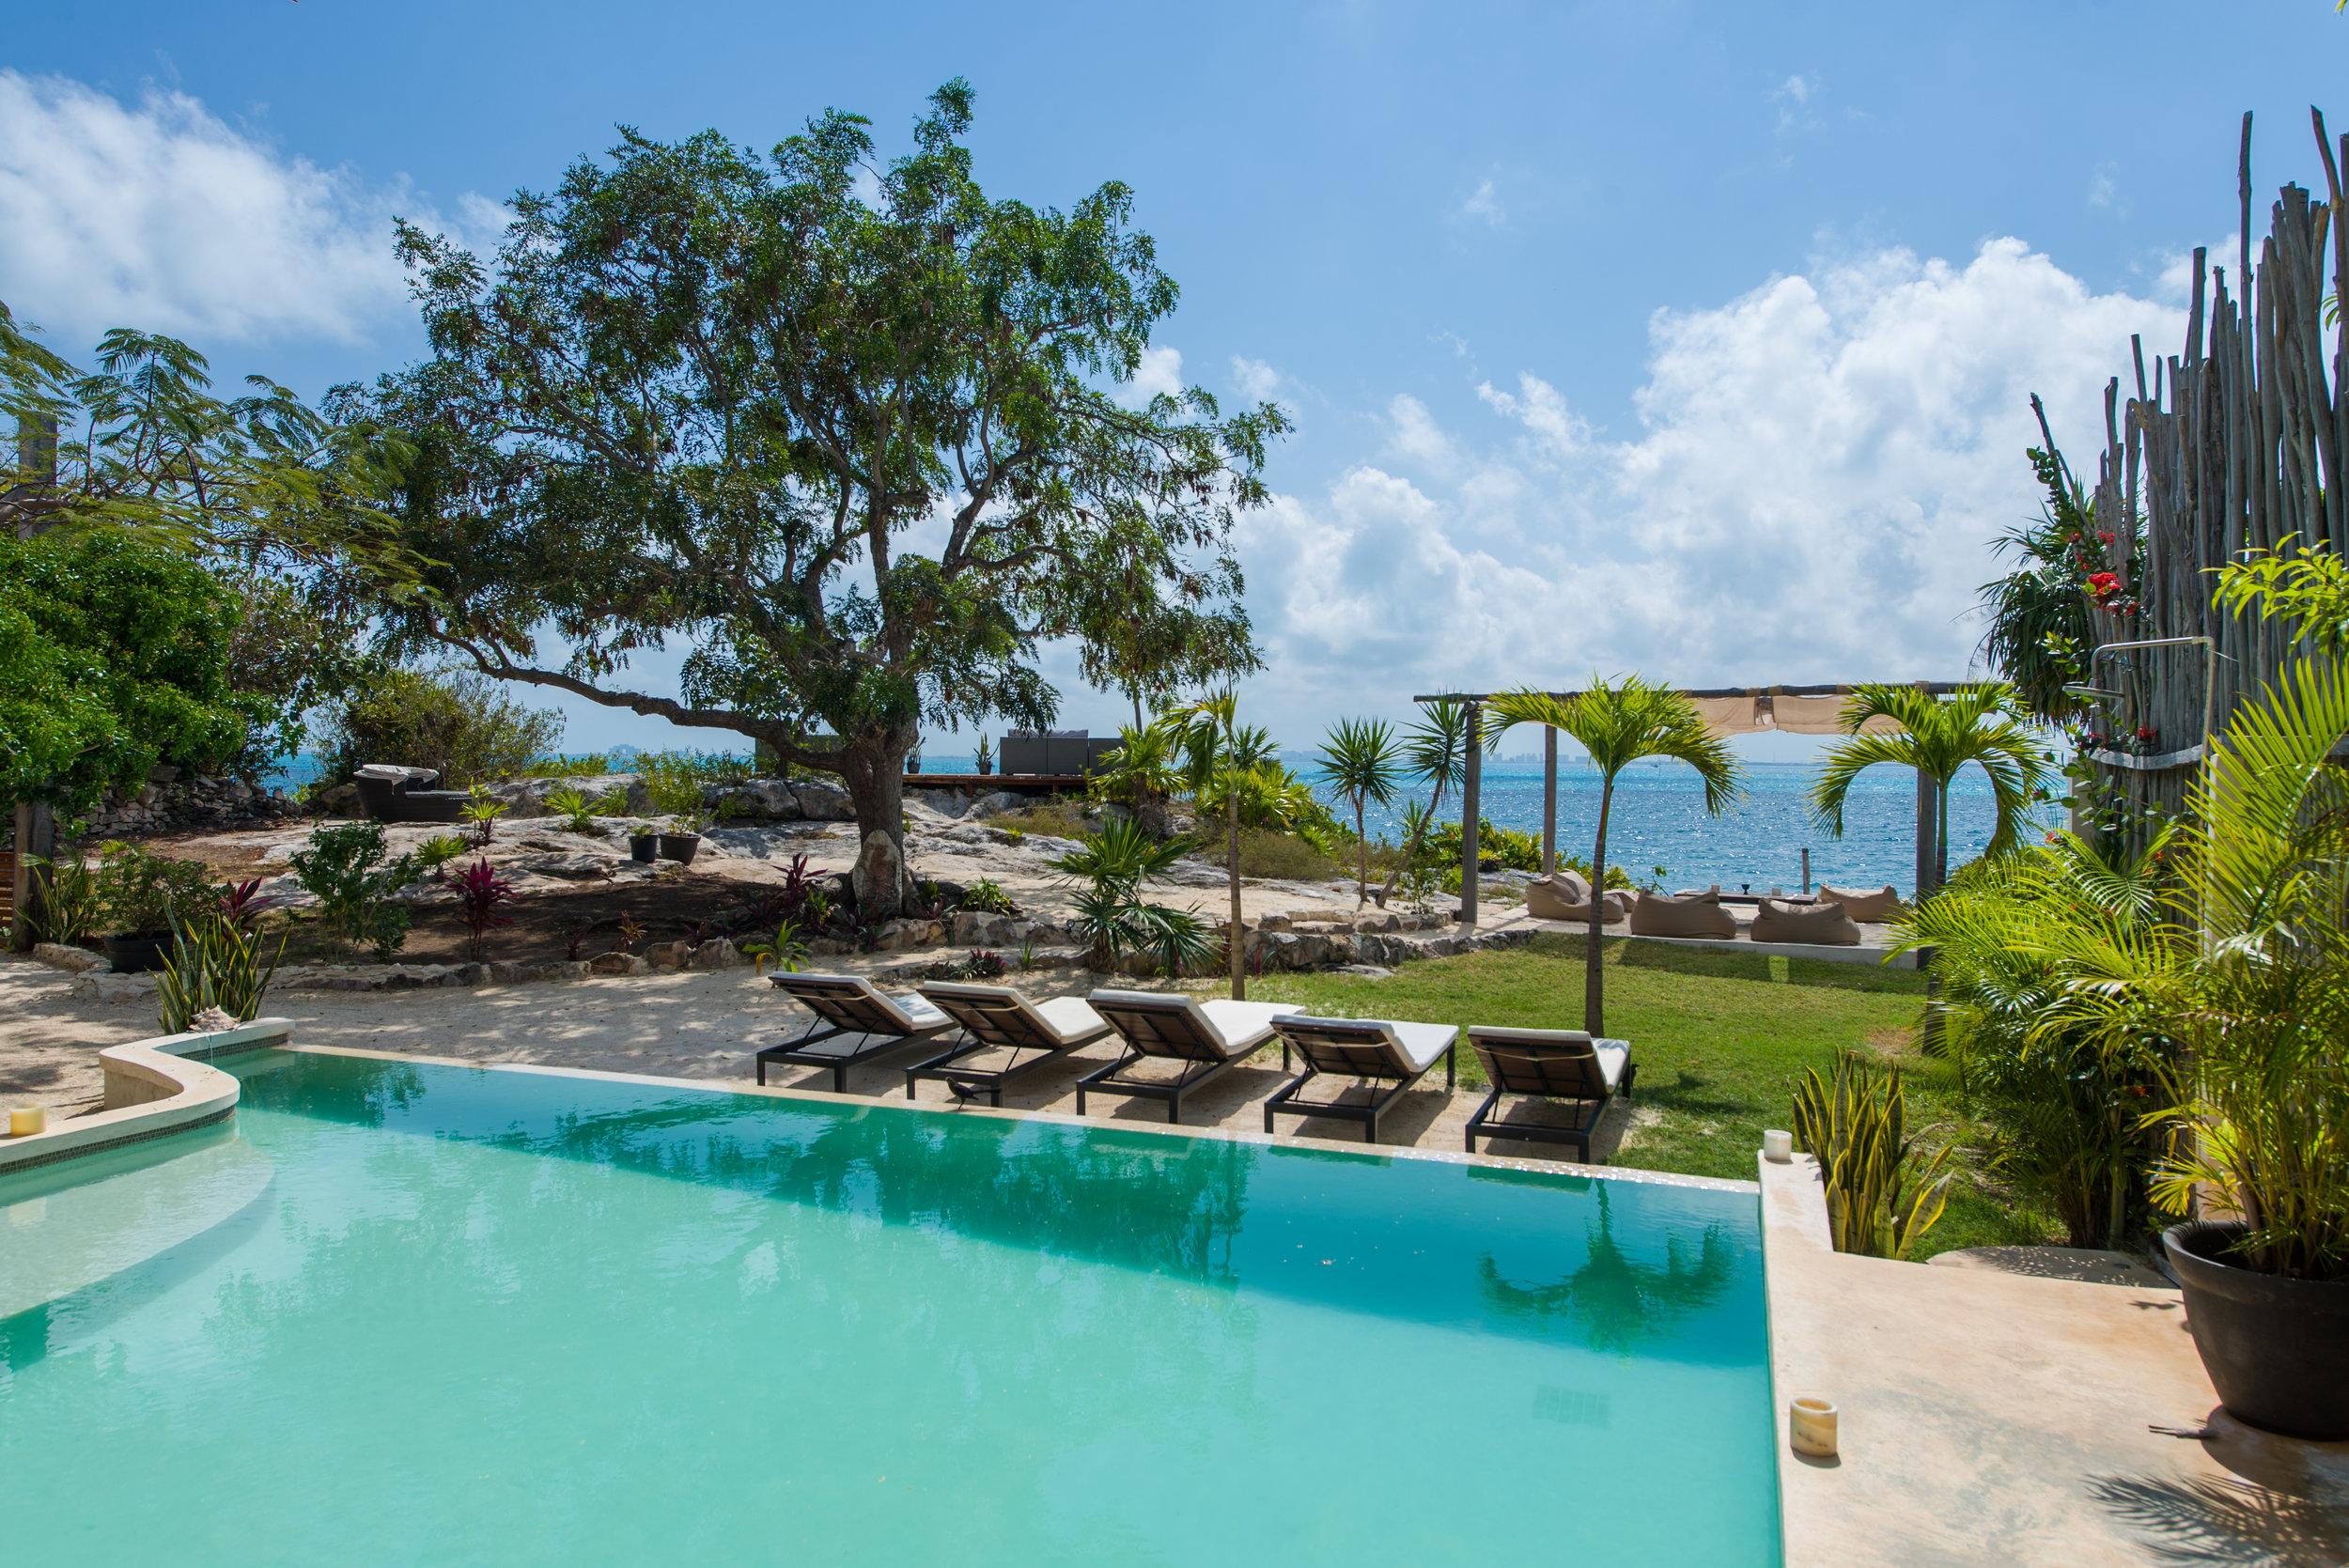 Casa Coco Isla Mujeres-7282.jpg